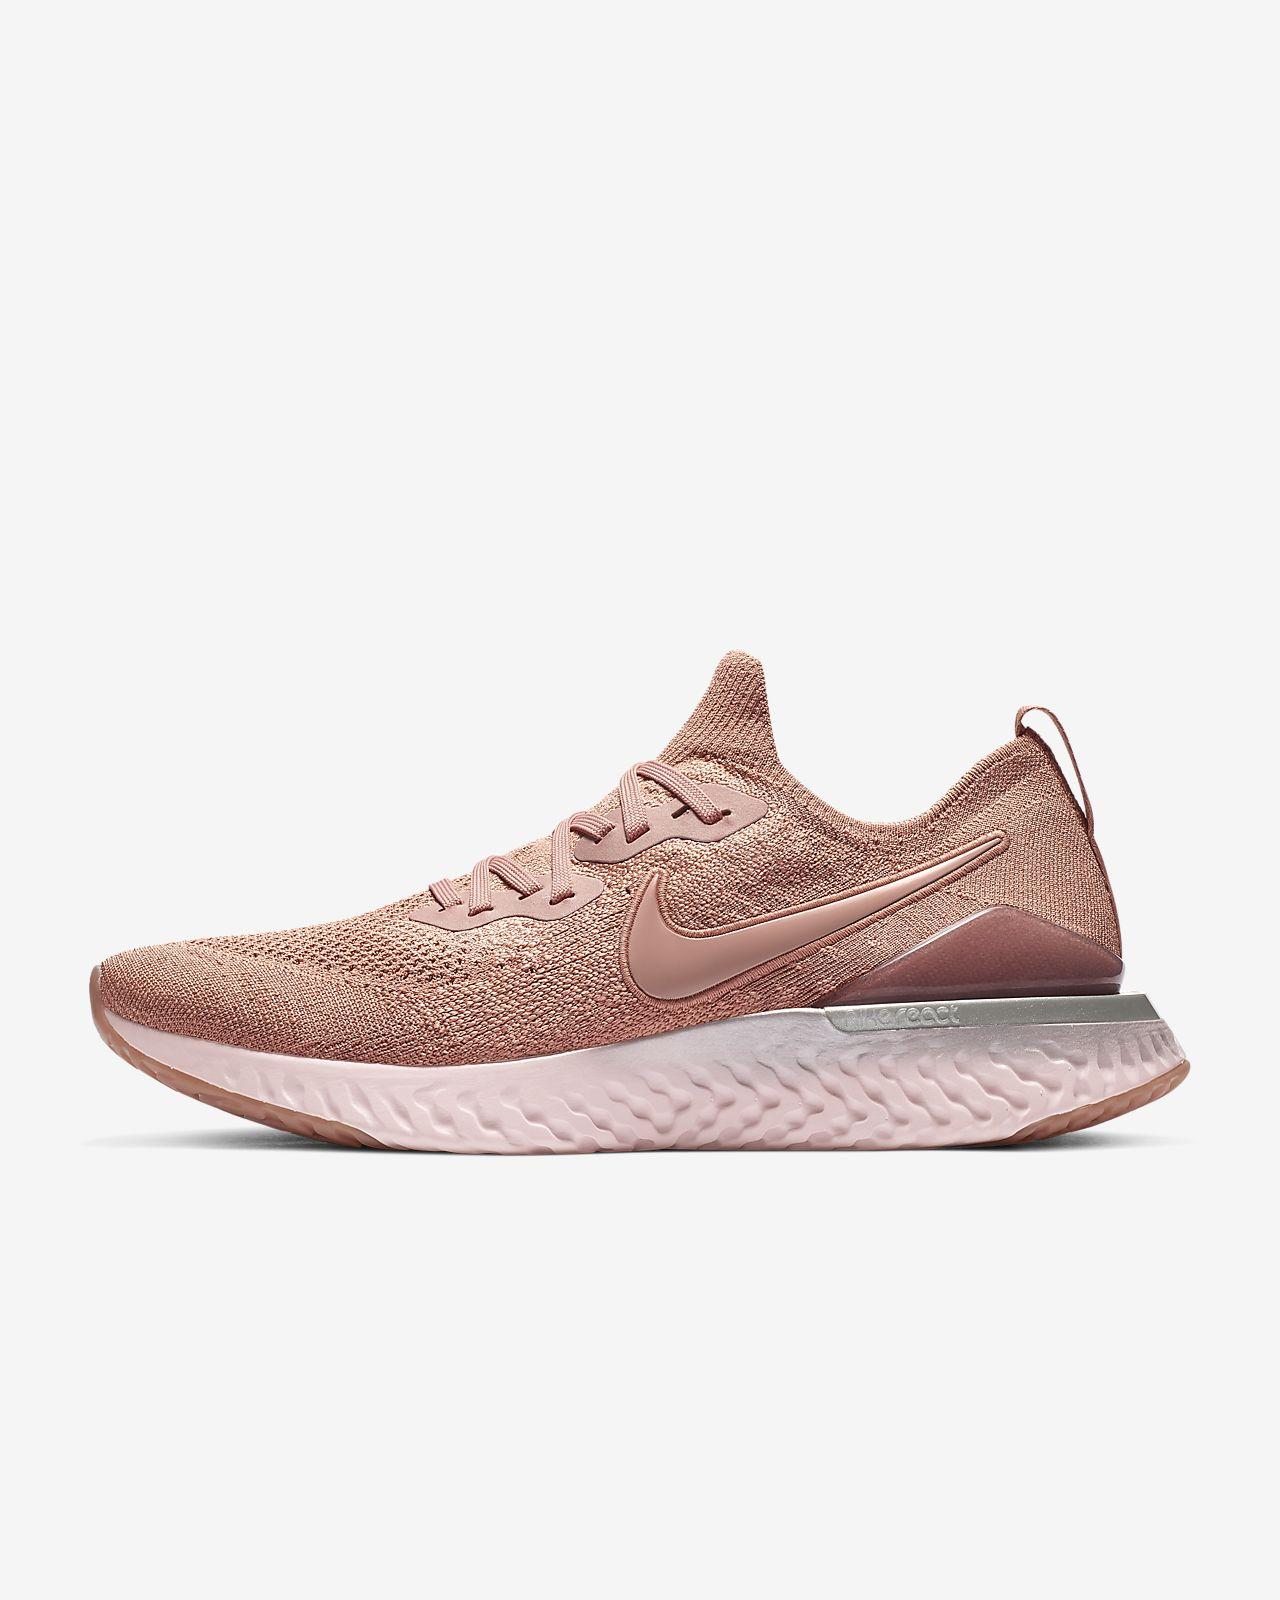 Nike Epic React Flyknit 2 Men's Running Shoe